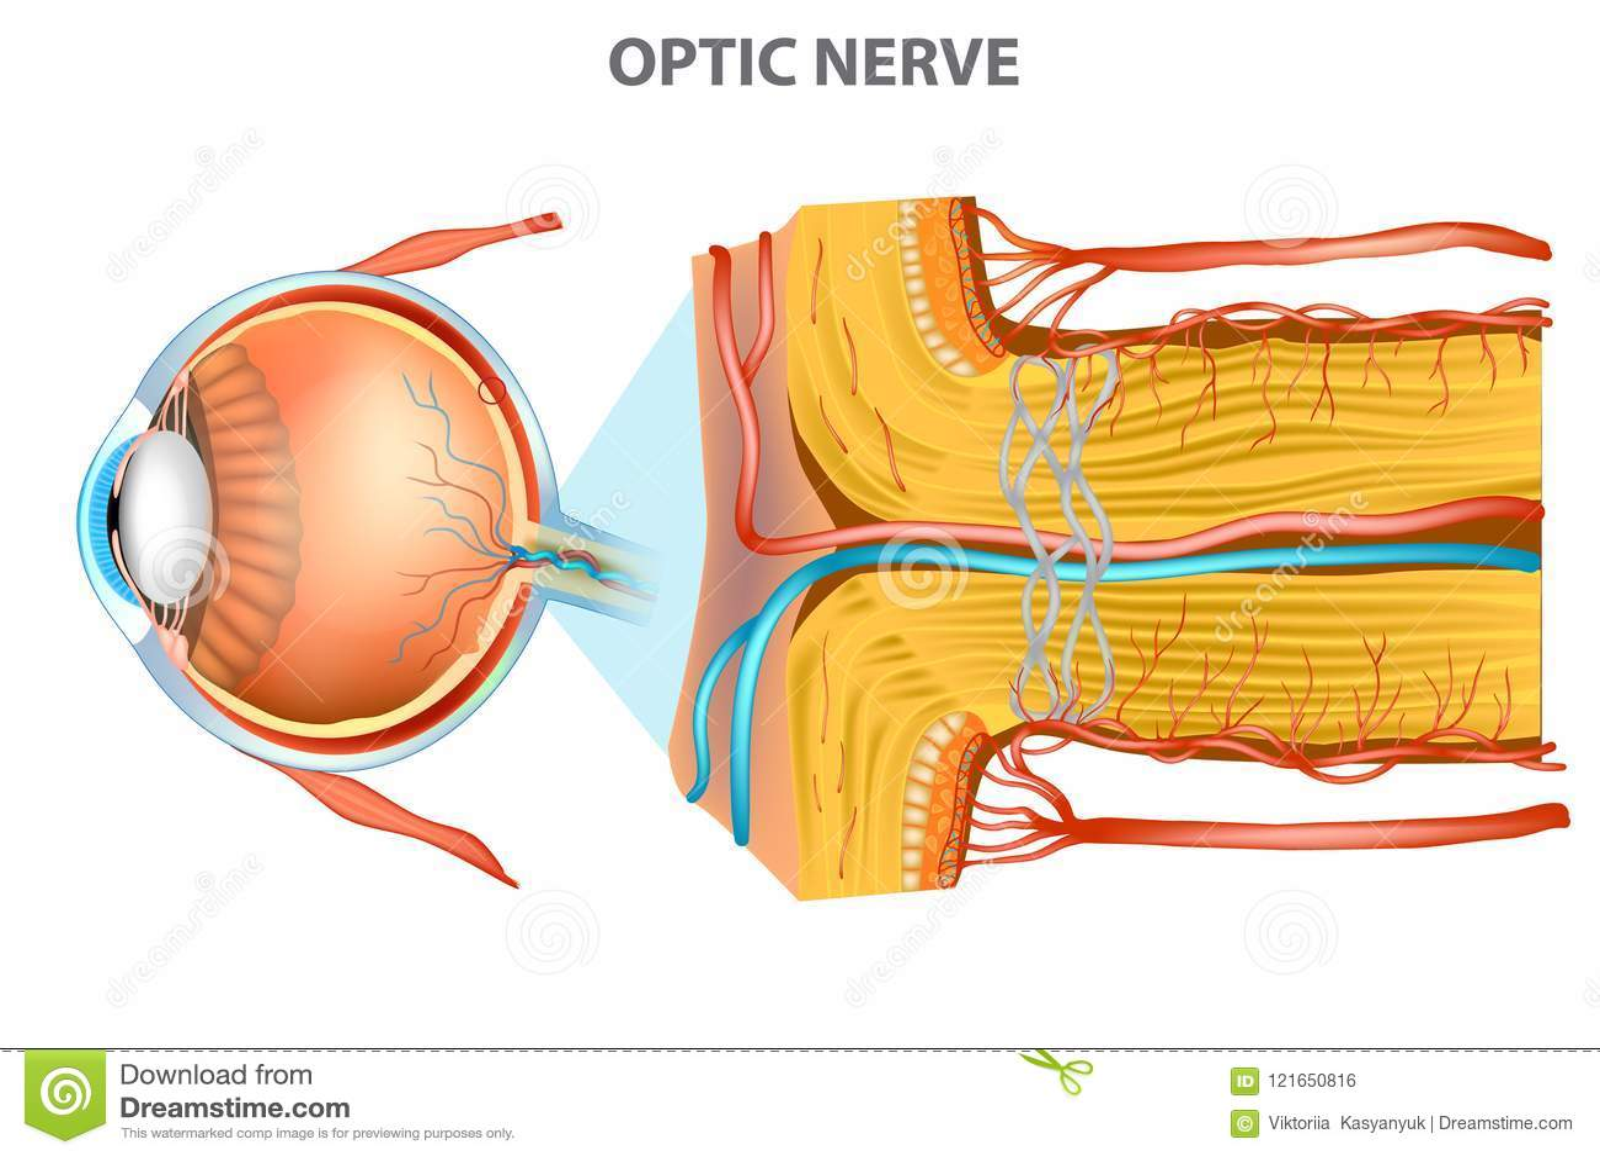 Nerve Cartoons  Illustrations  U0026 Vector Stock Images